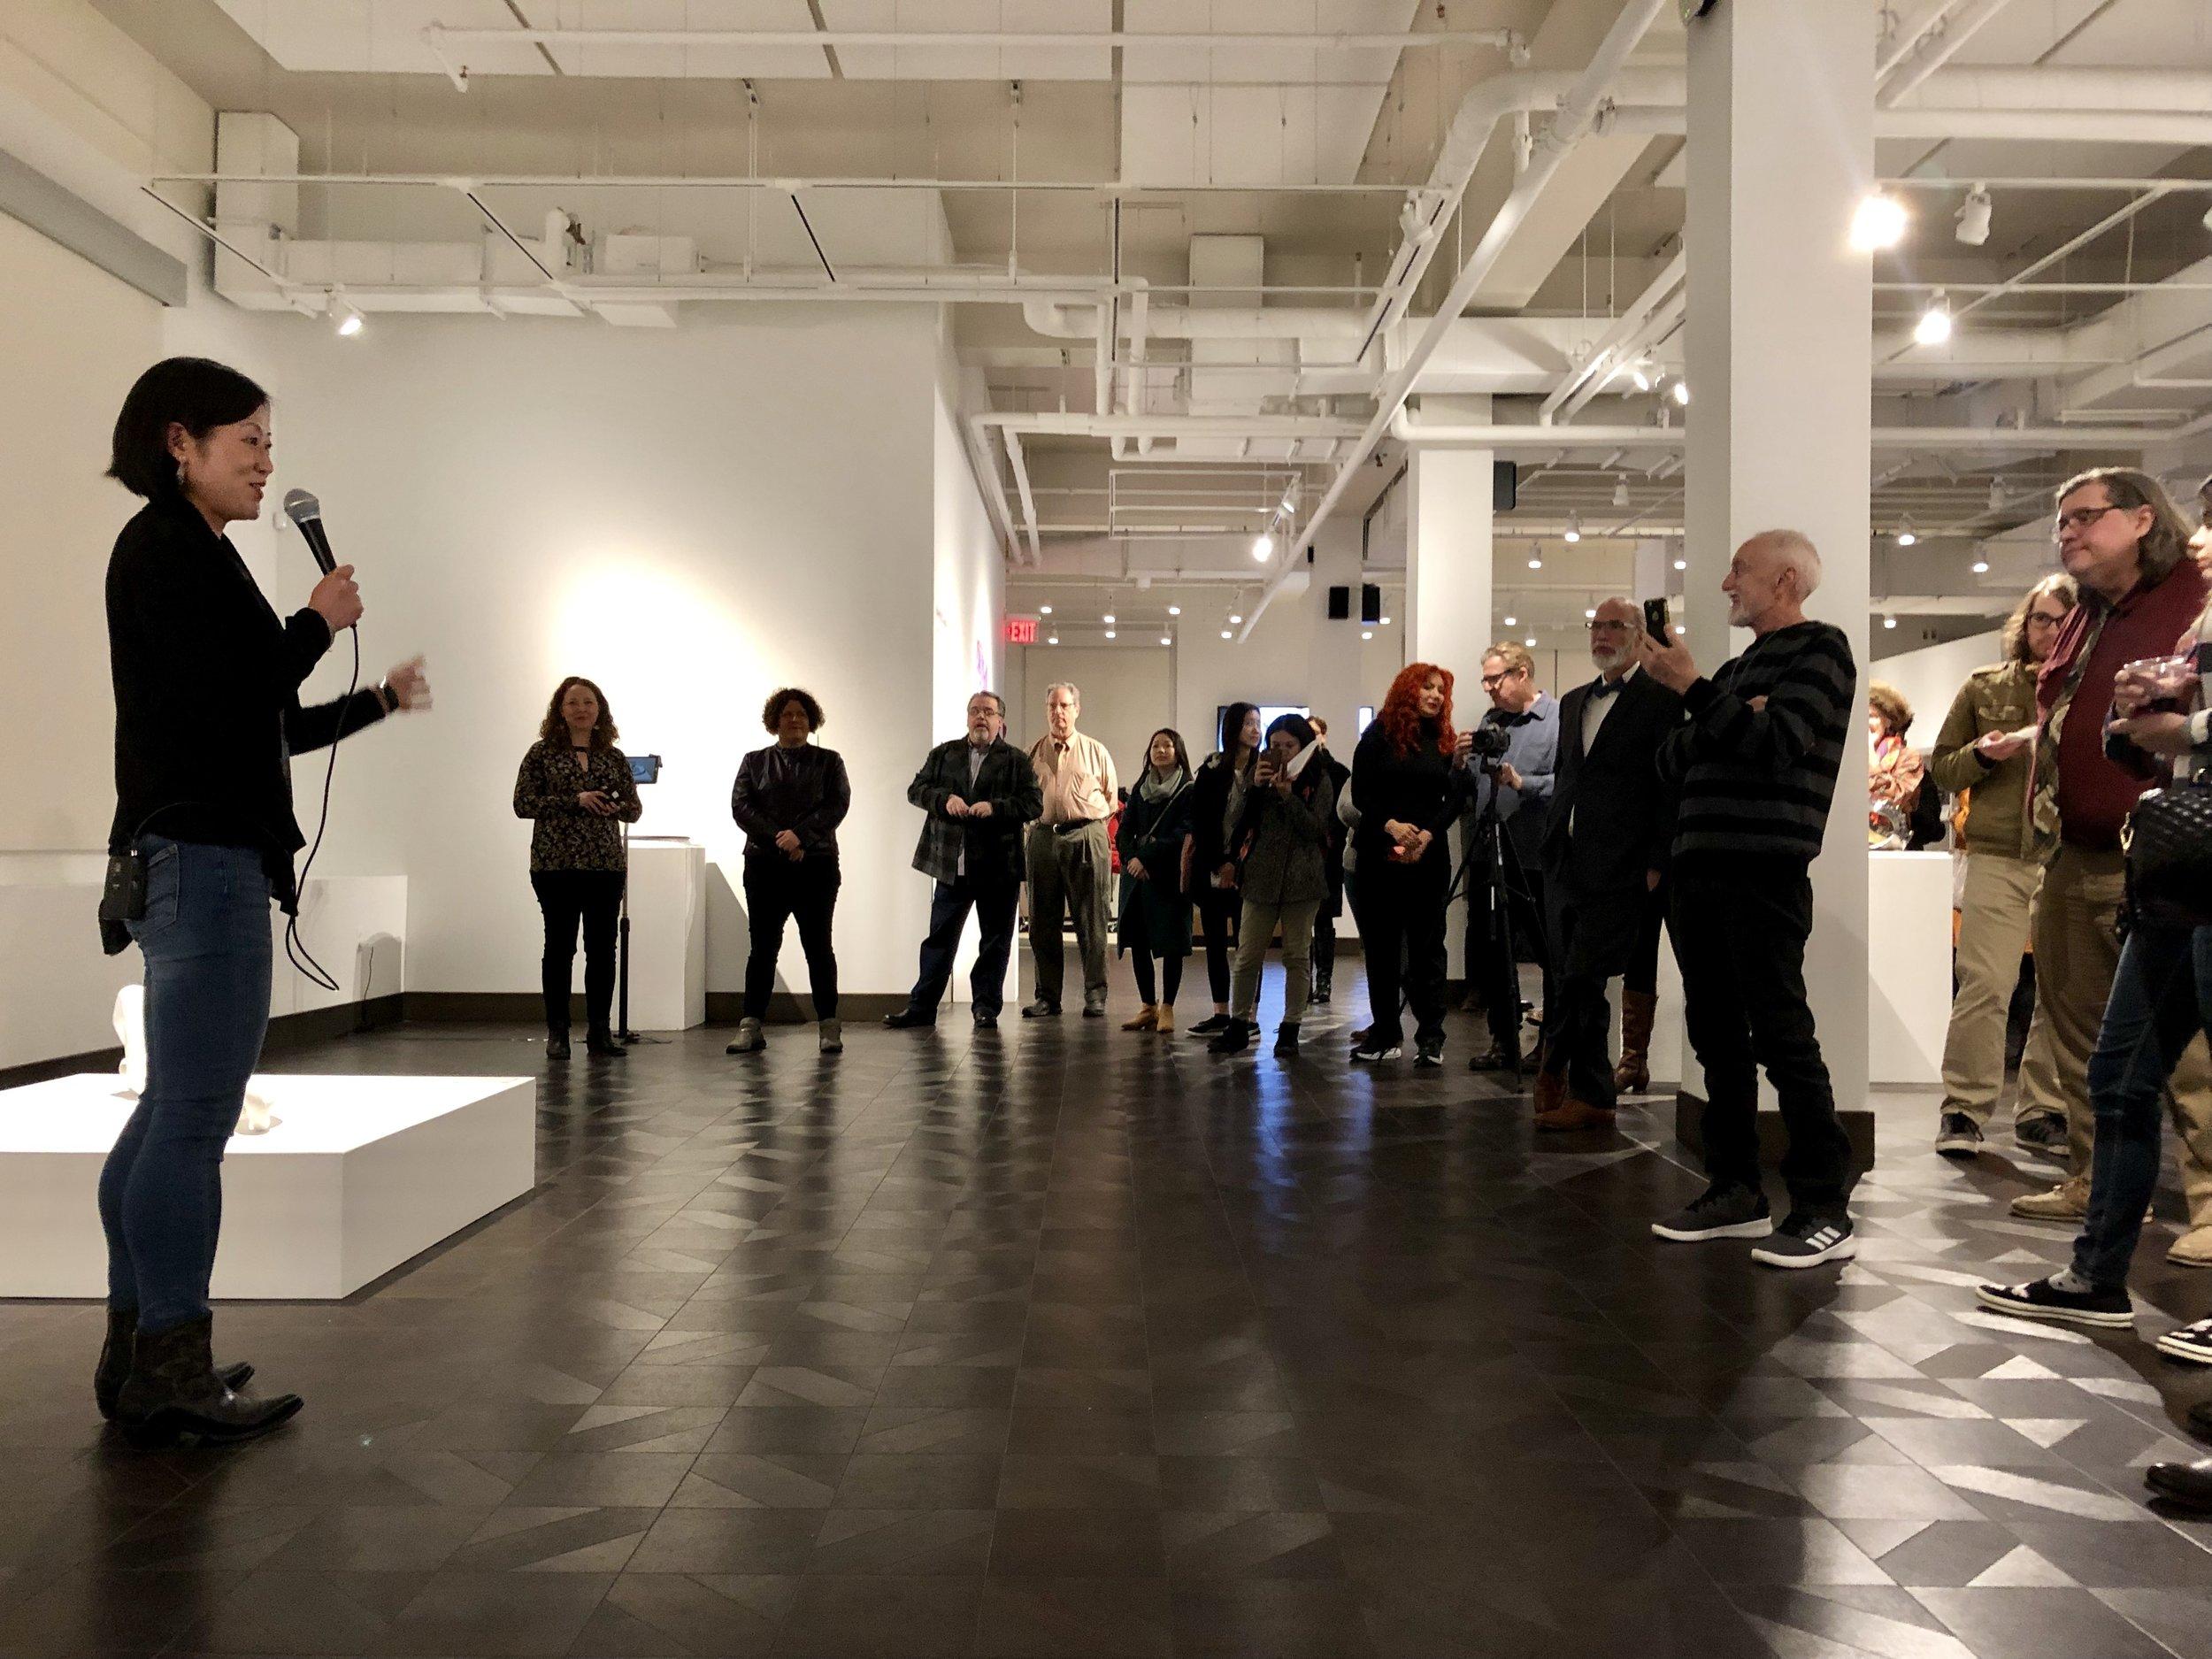 Mari Ogihara giving an artist talk for  Enamored Armor  at Rowan University, curated by Amie Potsic